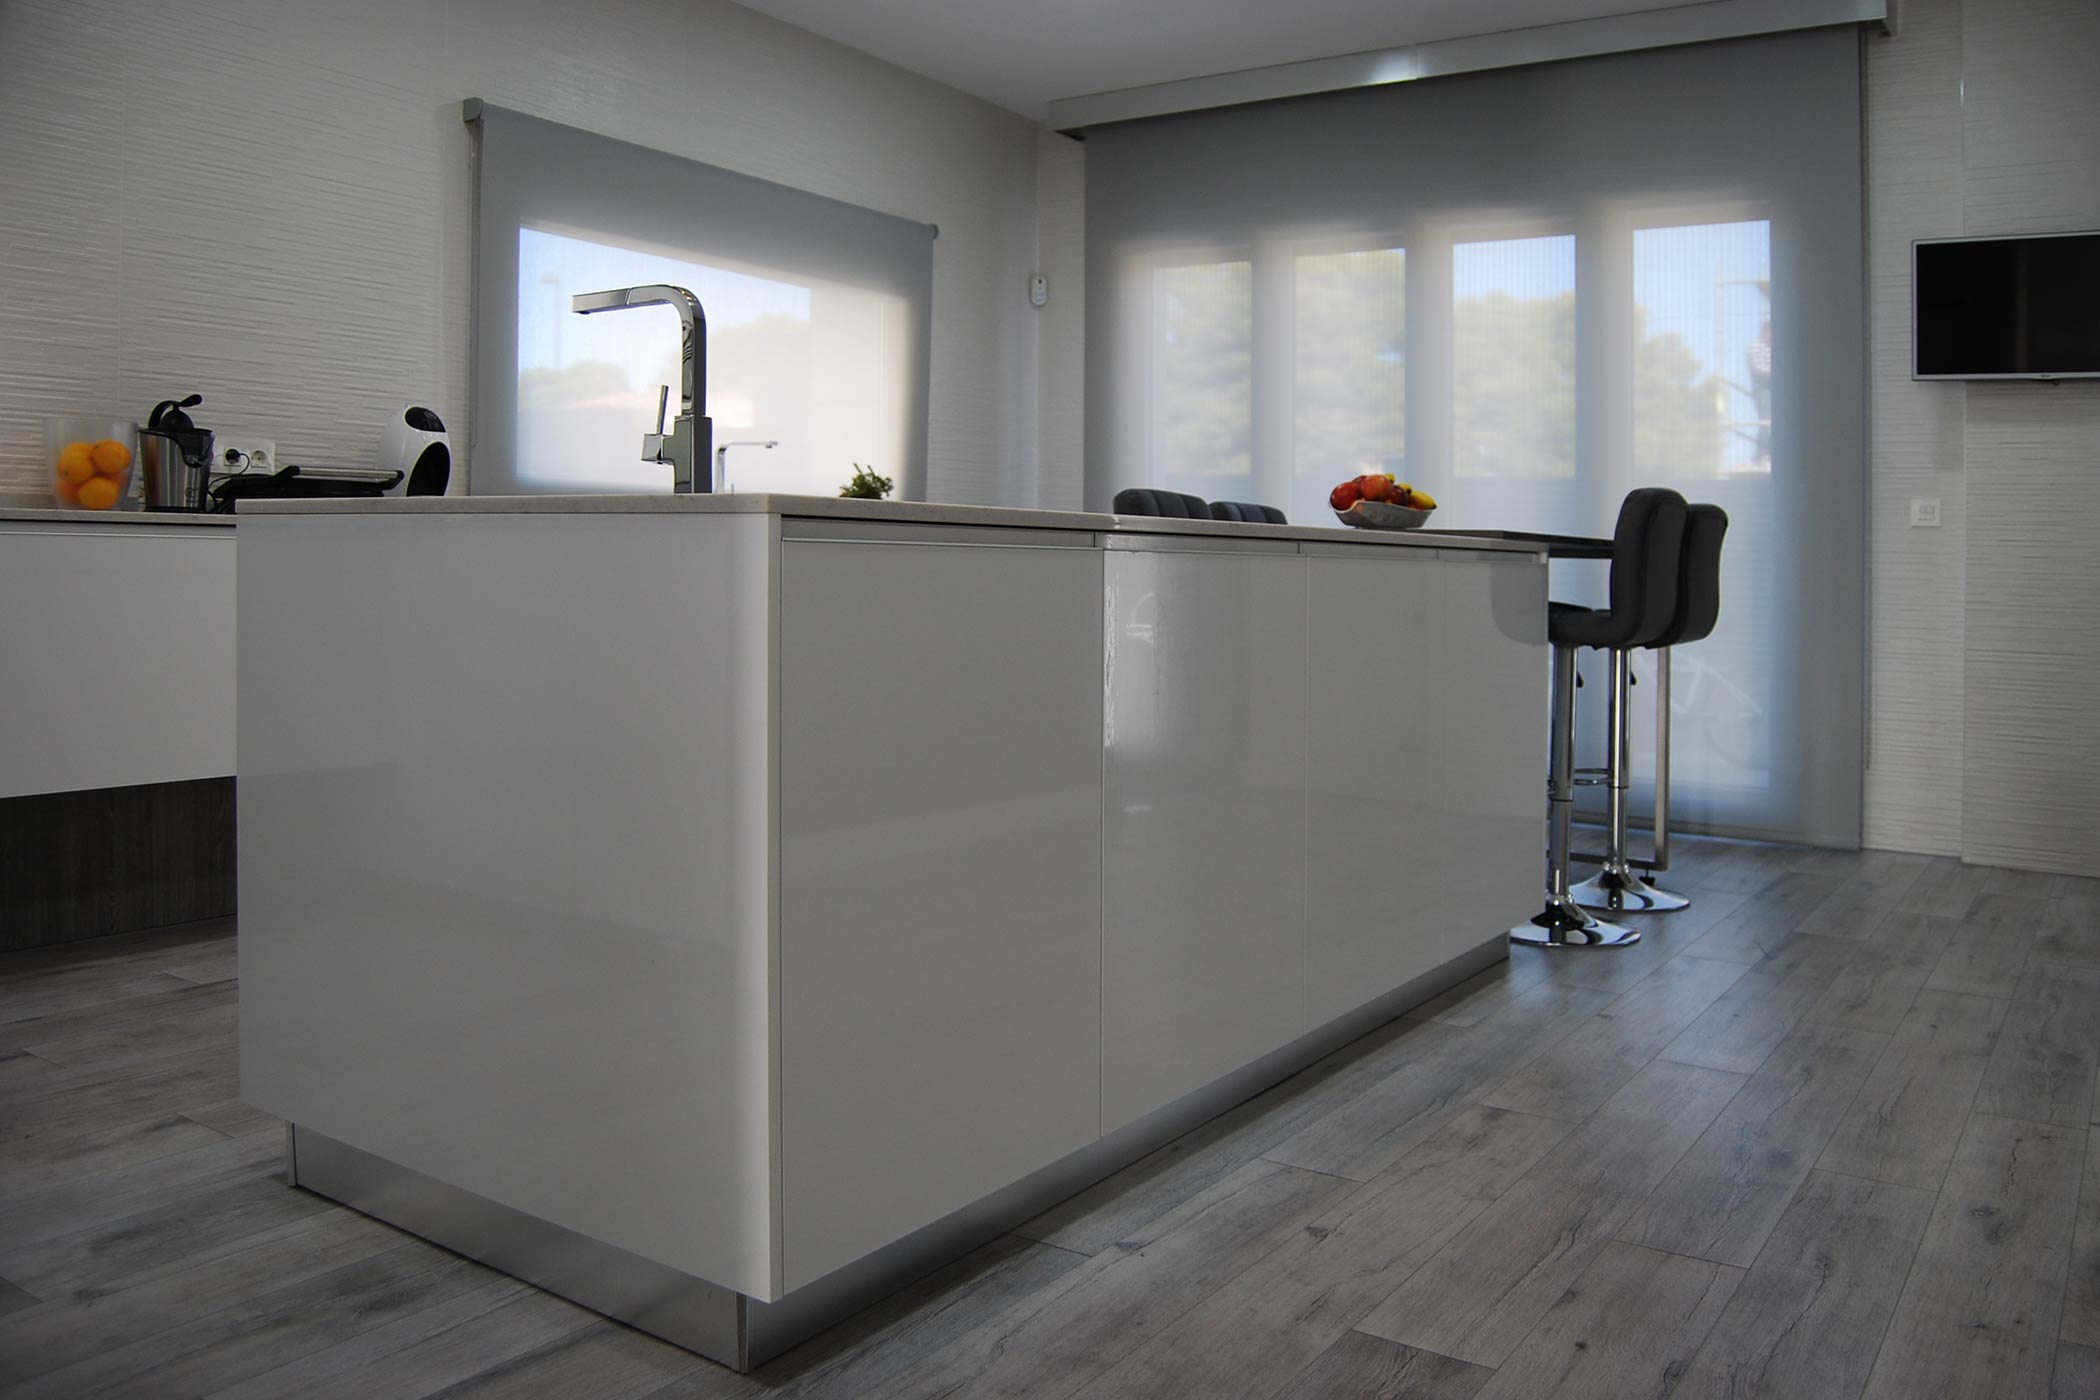 Isla de cocina en blanco brillo con puerta tirador aluminio incorporado